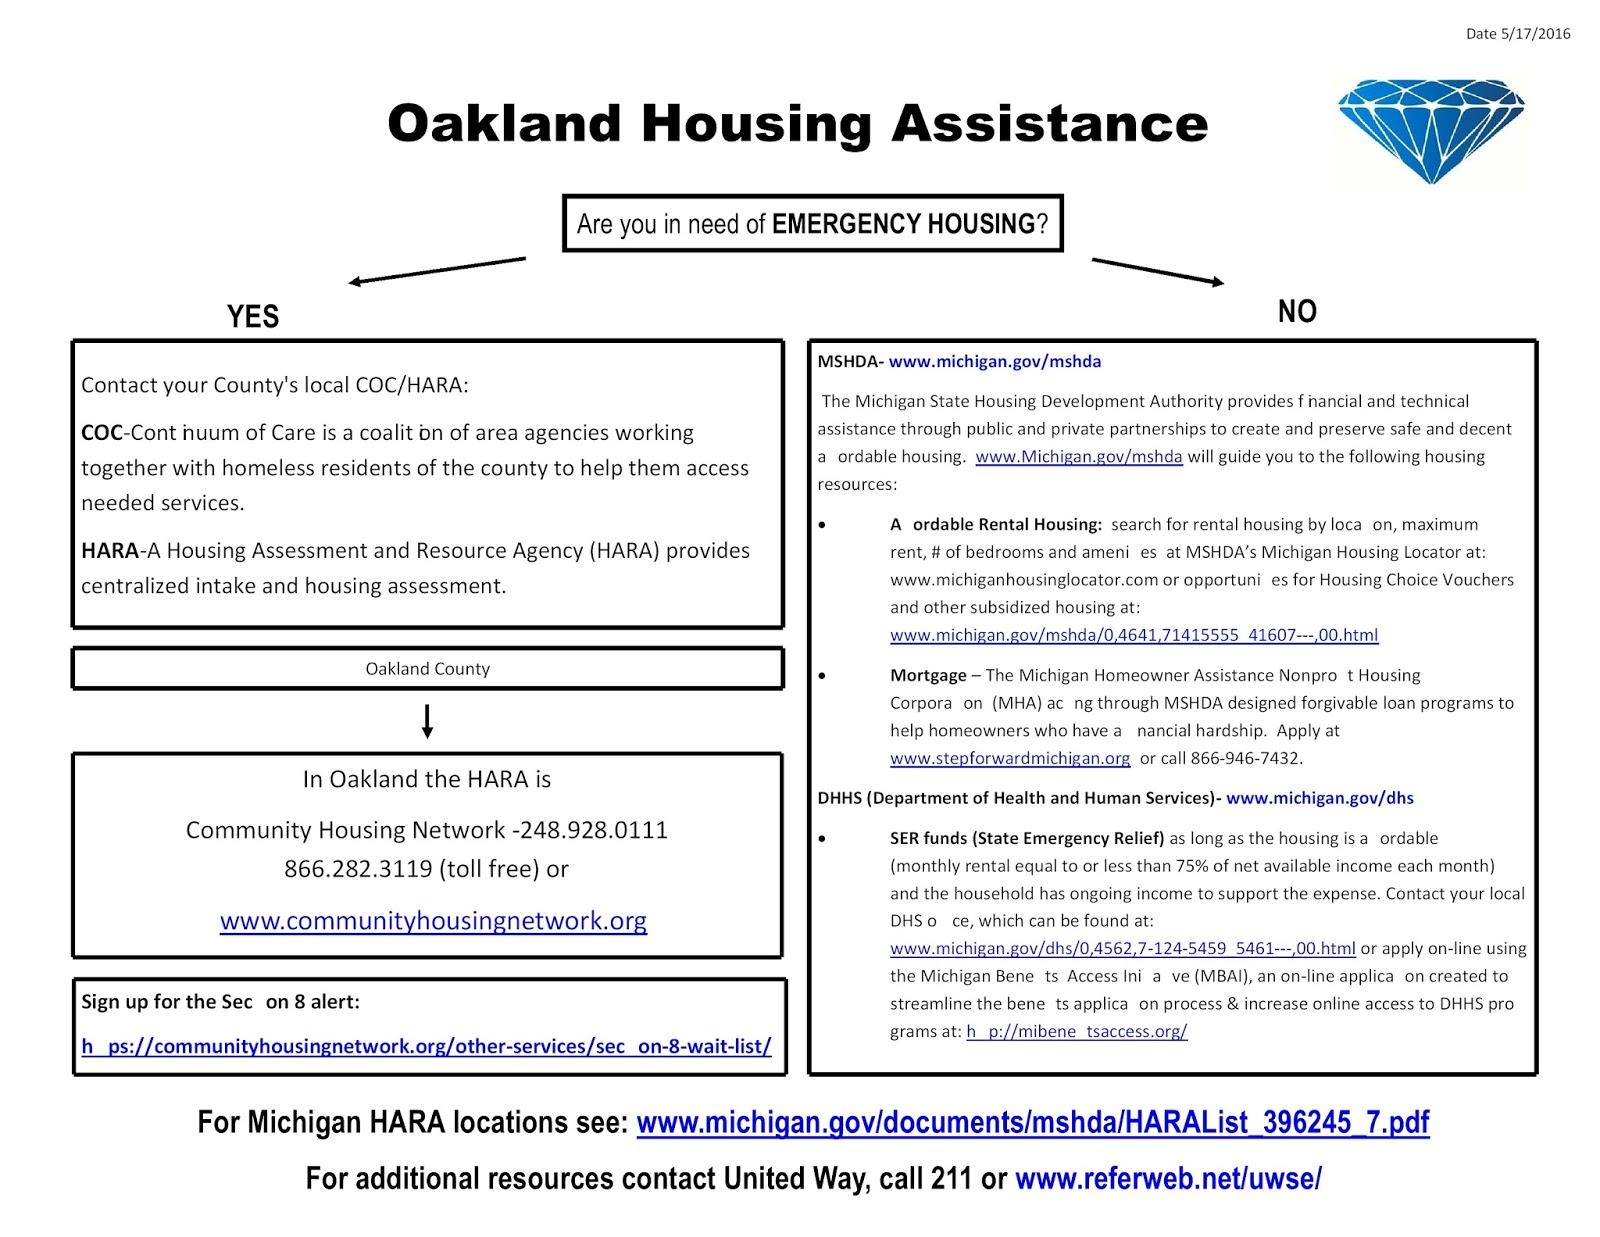 Michigan Section 8 Housing Locator